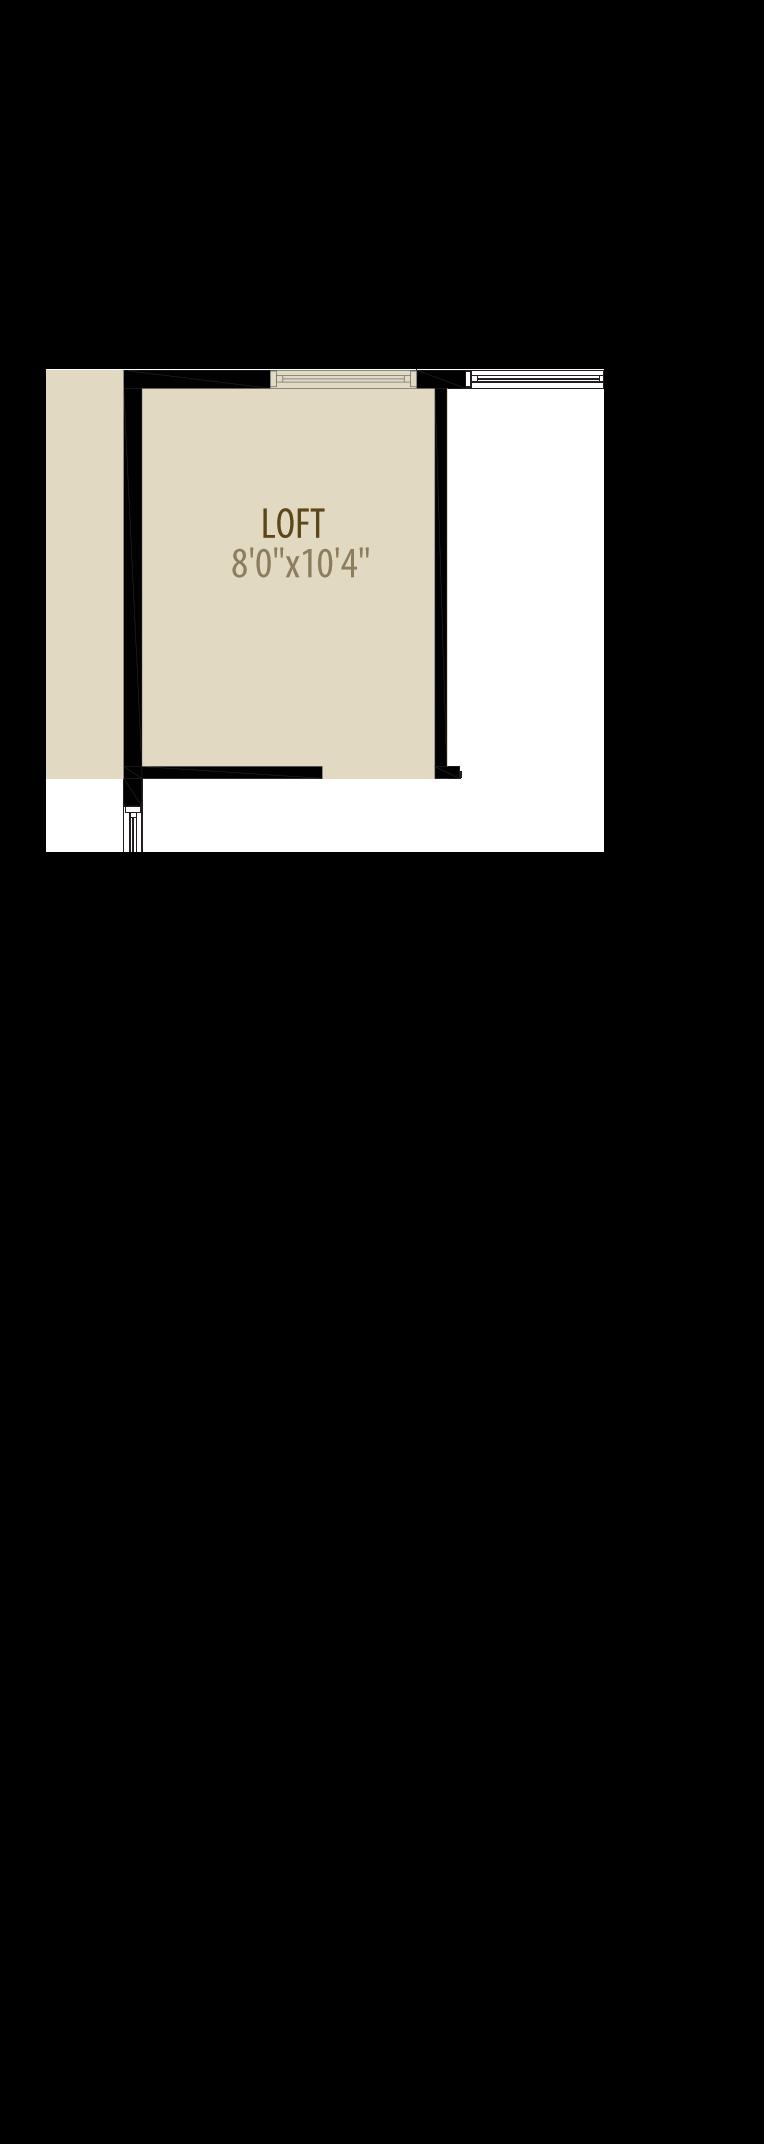 Option 1 Loft